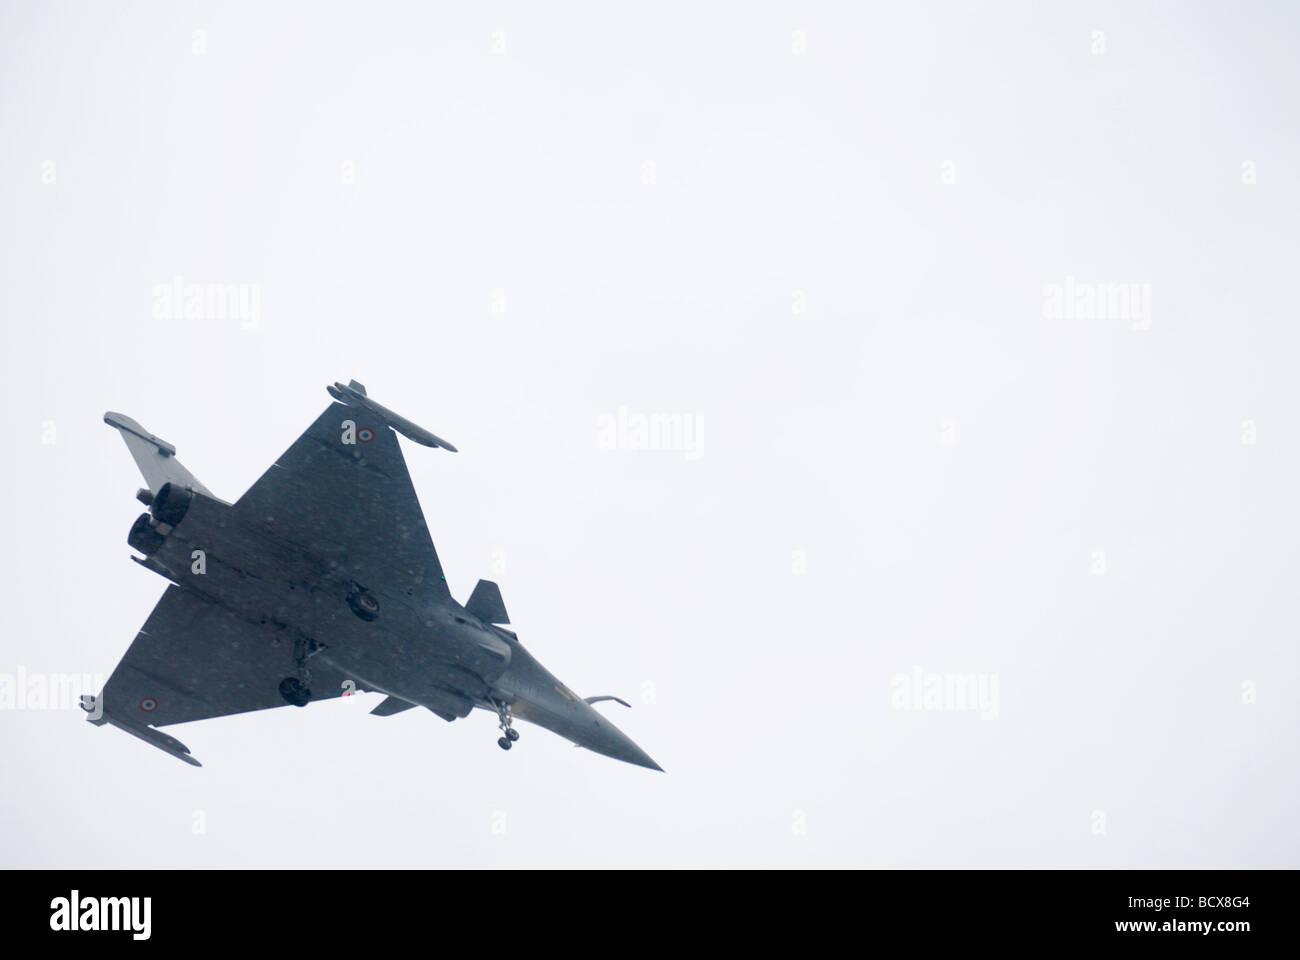 Dassault Mirage 2000 un jet de combate multirole francés en vuelo Foto de stock